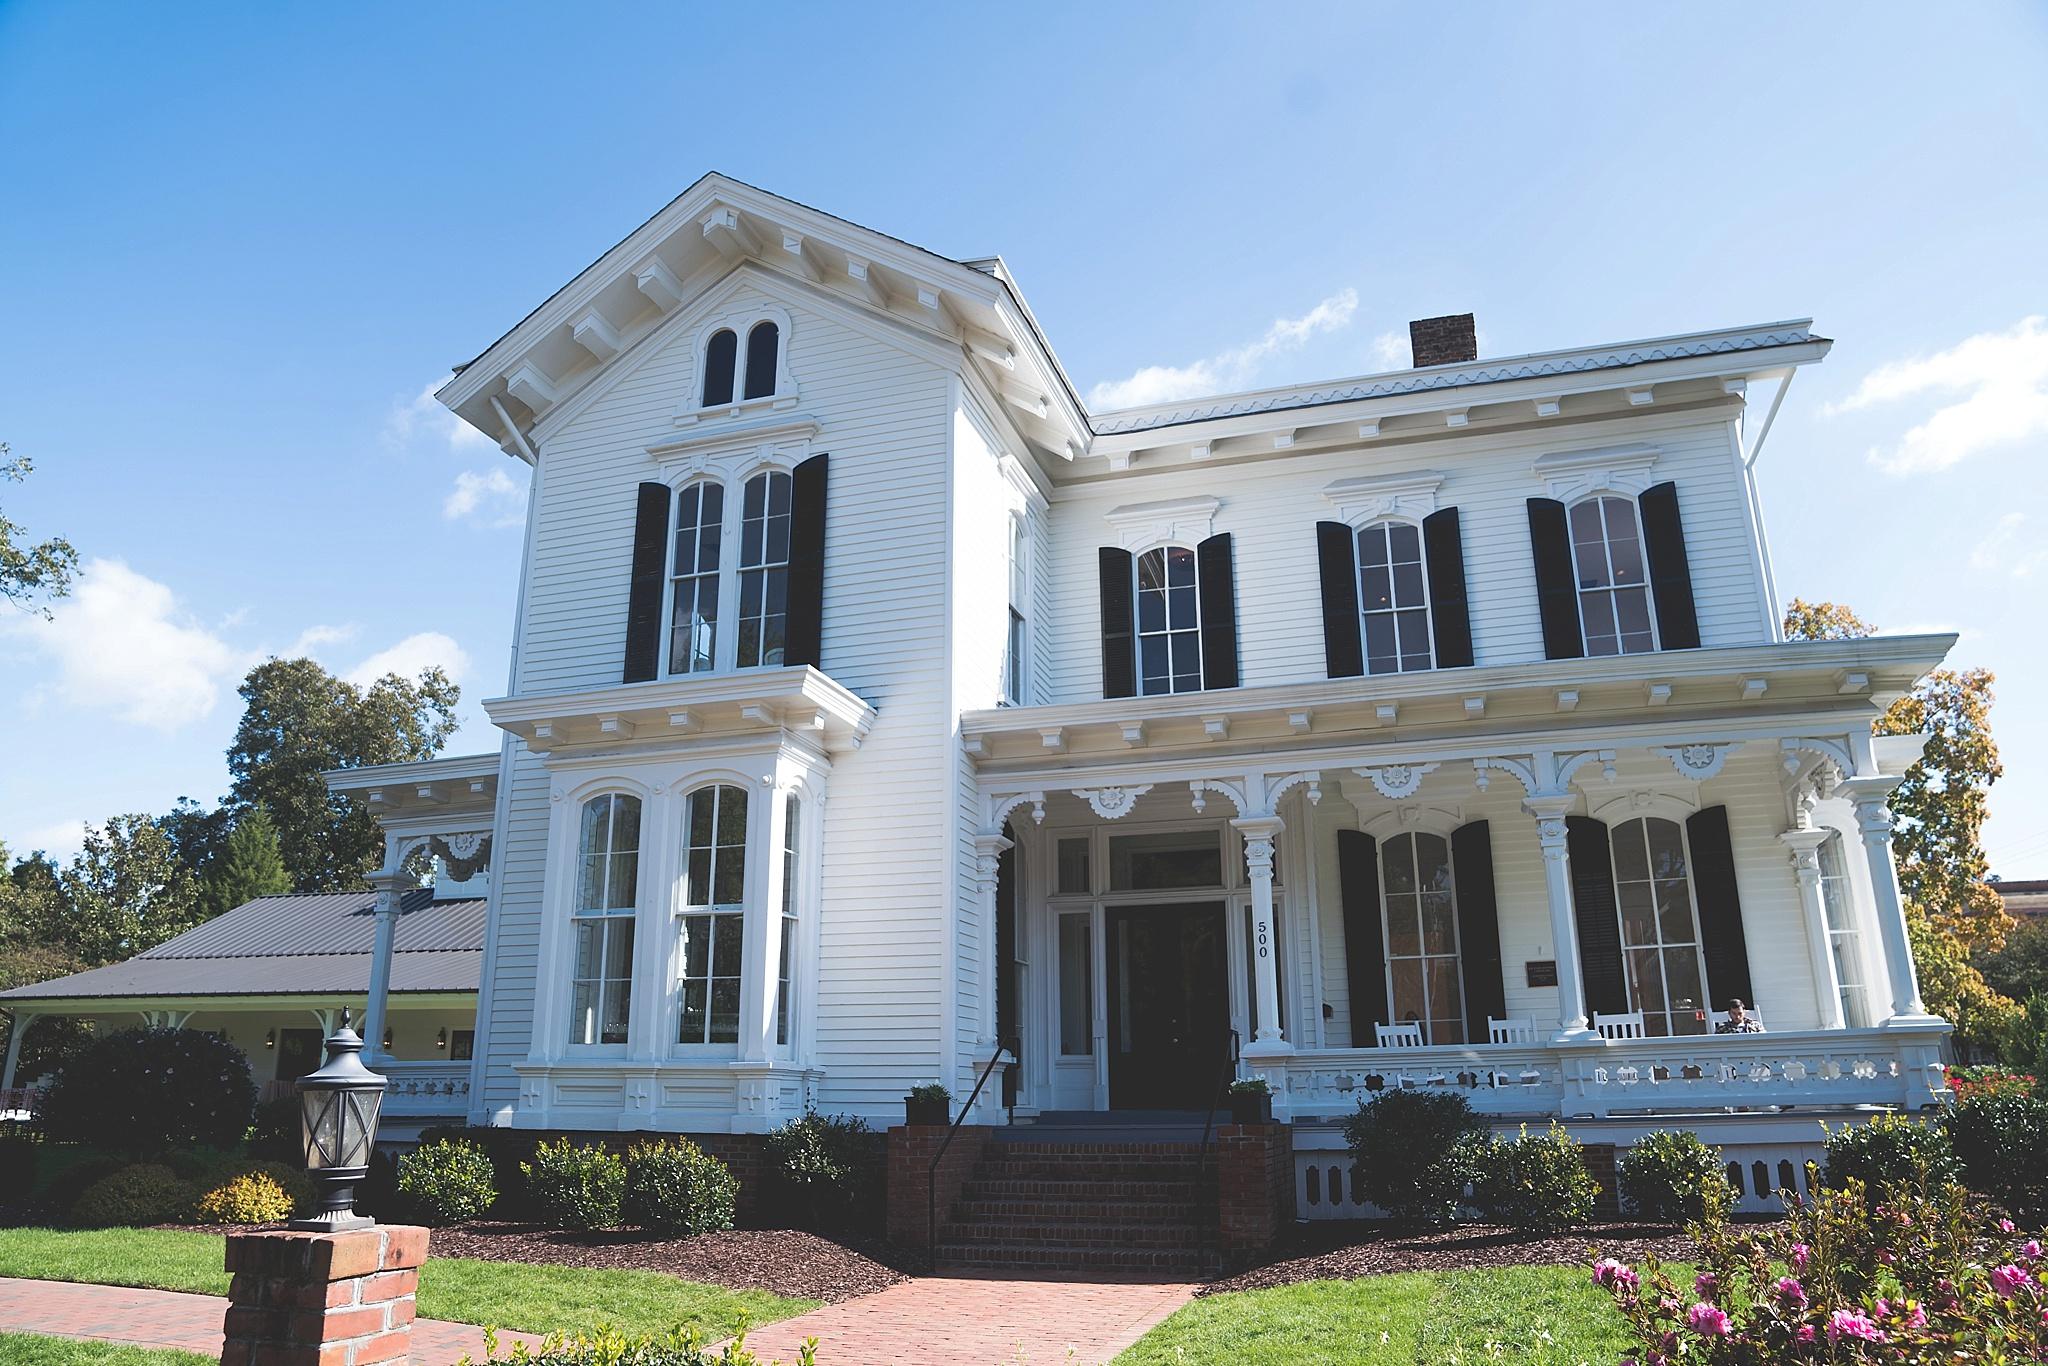 Merrimon-Wynne-House-Photographer-124.jpg